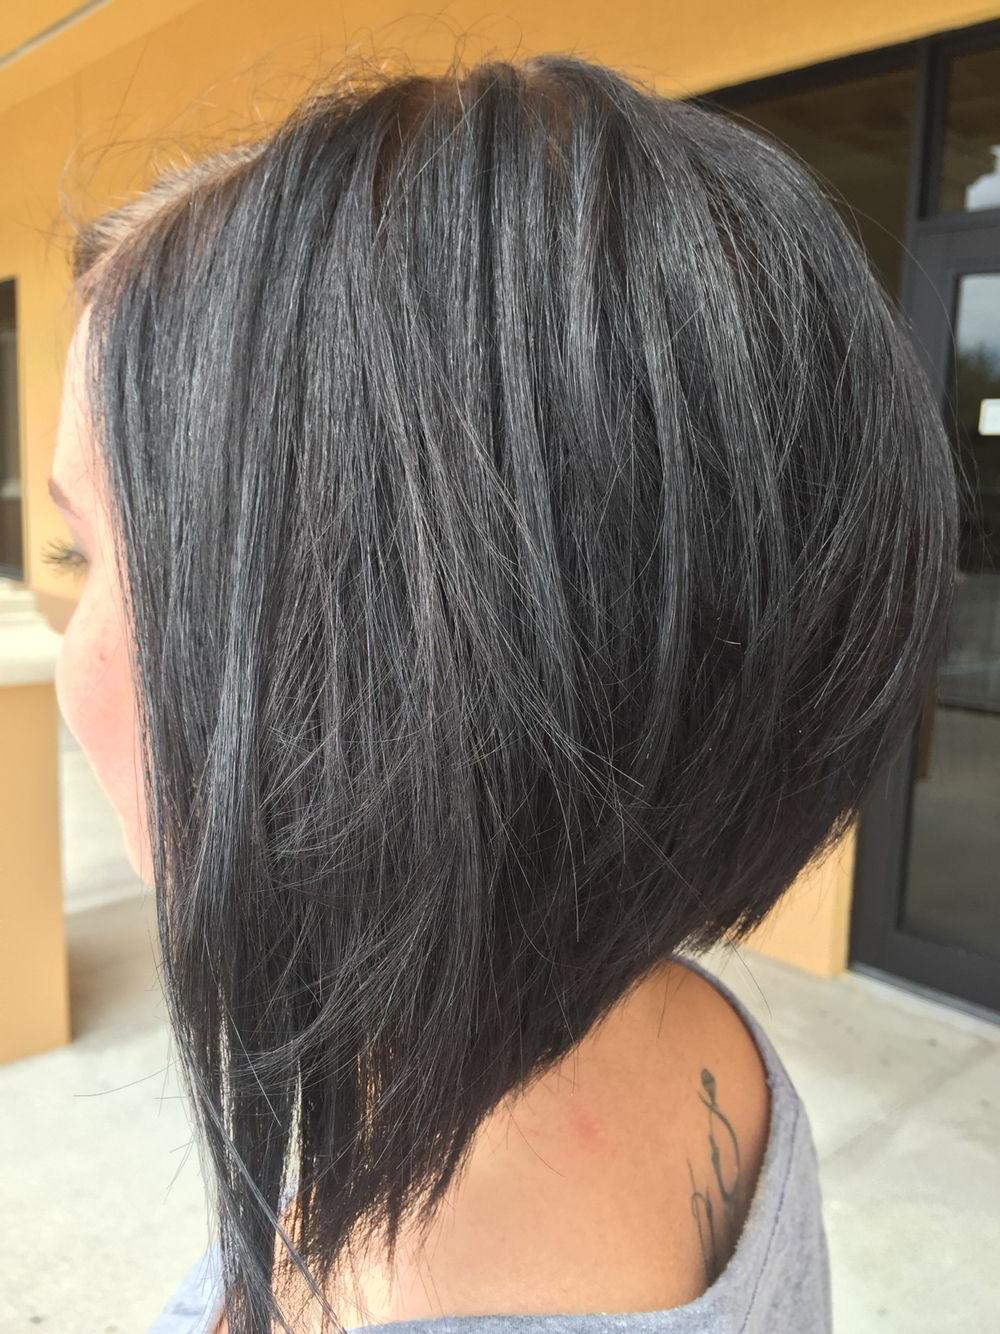 Edgy Bob   Hair In 2018   Pinterest   Hair, Hair Styles And Hair Cuts Regarding Edgy Short Bob Haircuts (View 4 of 25)